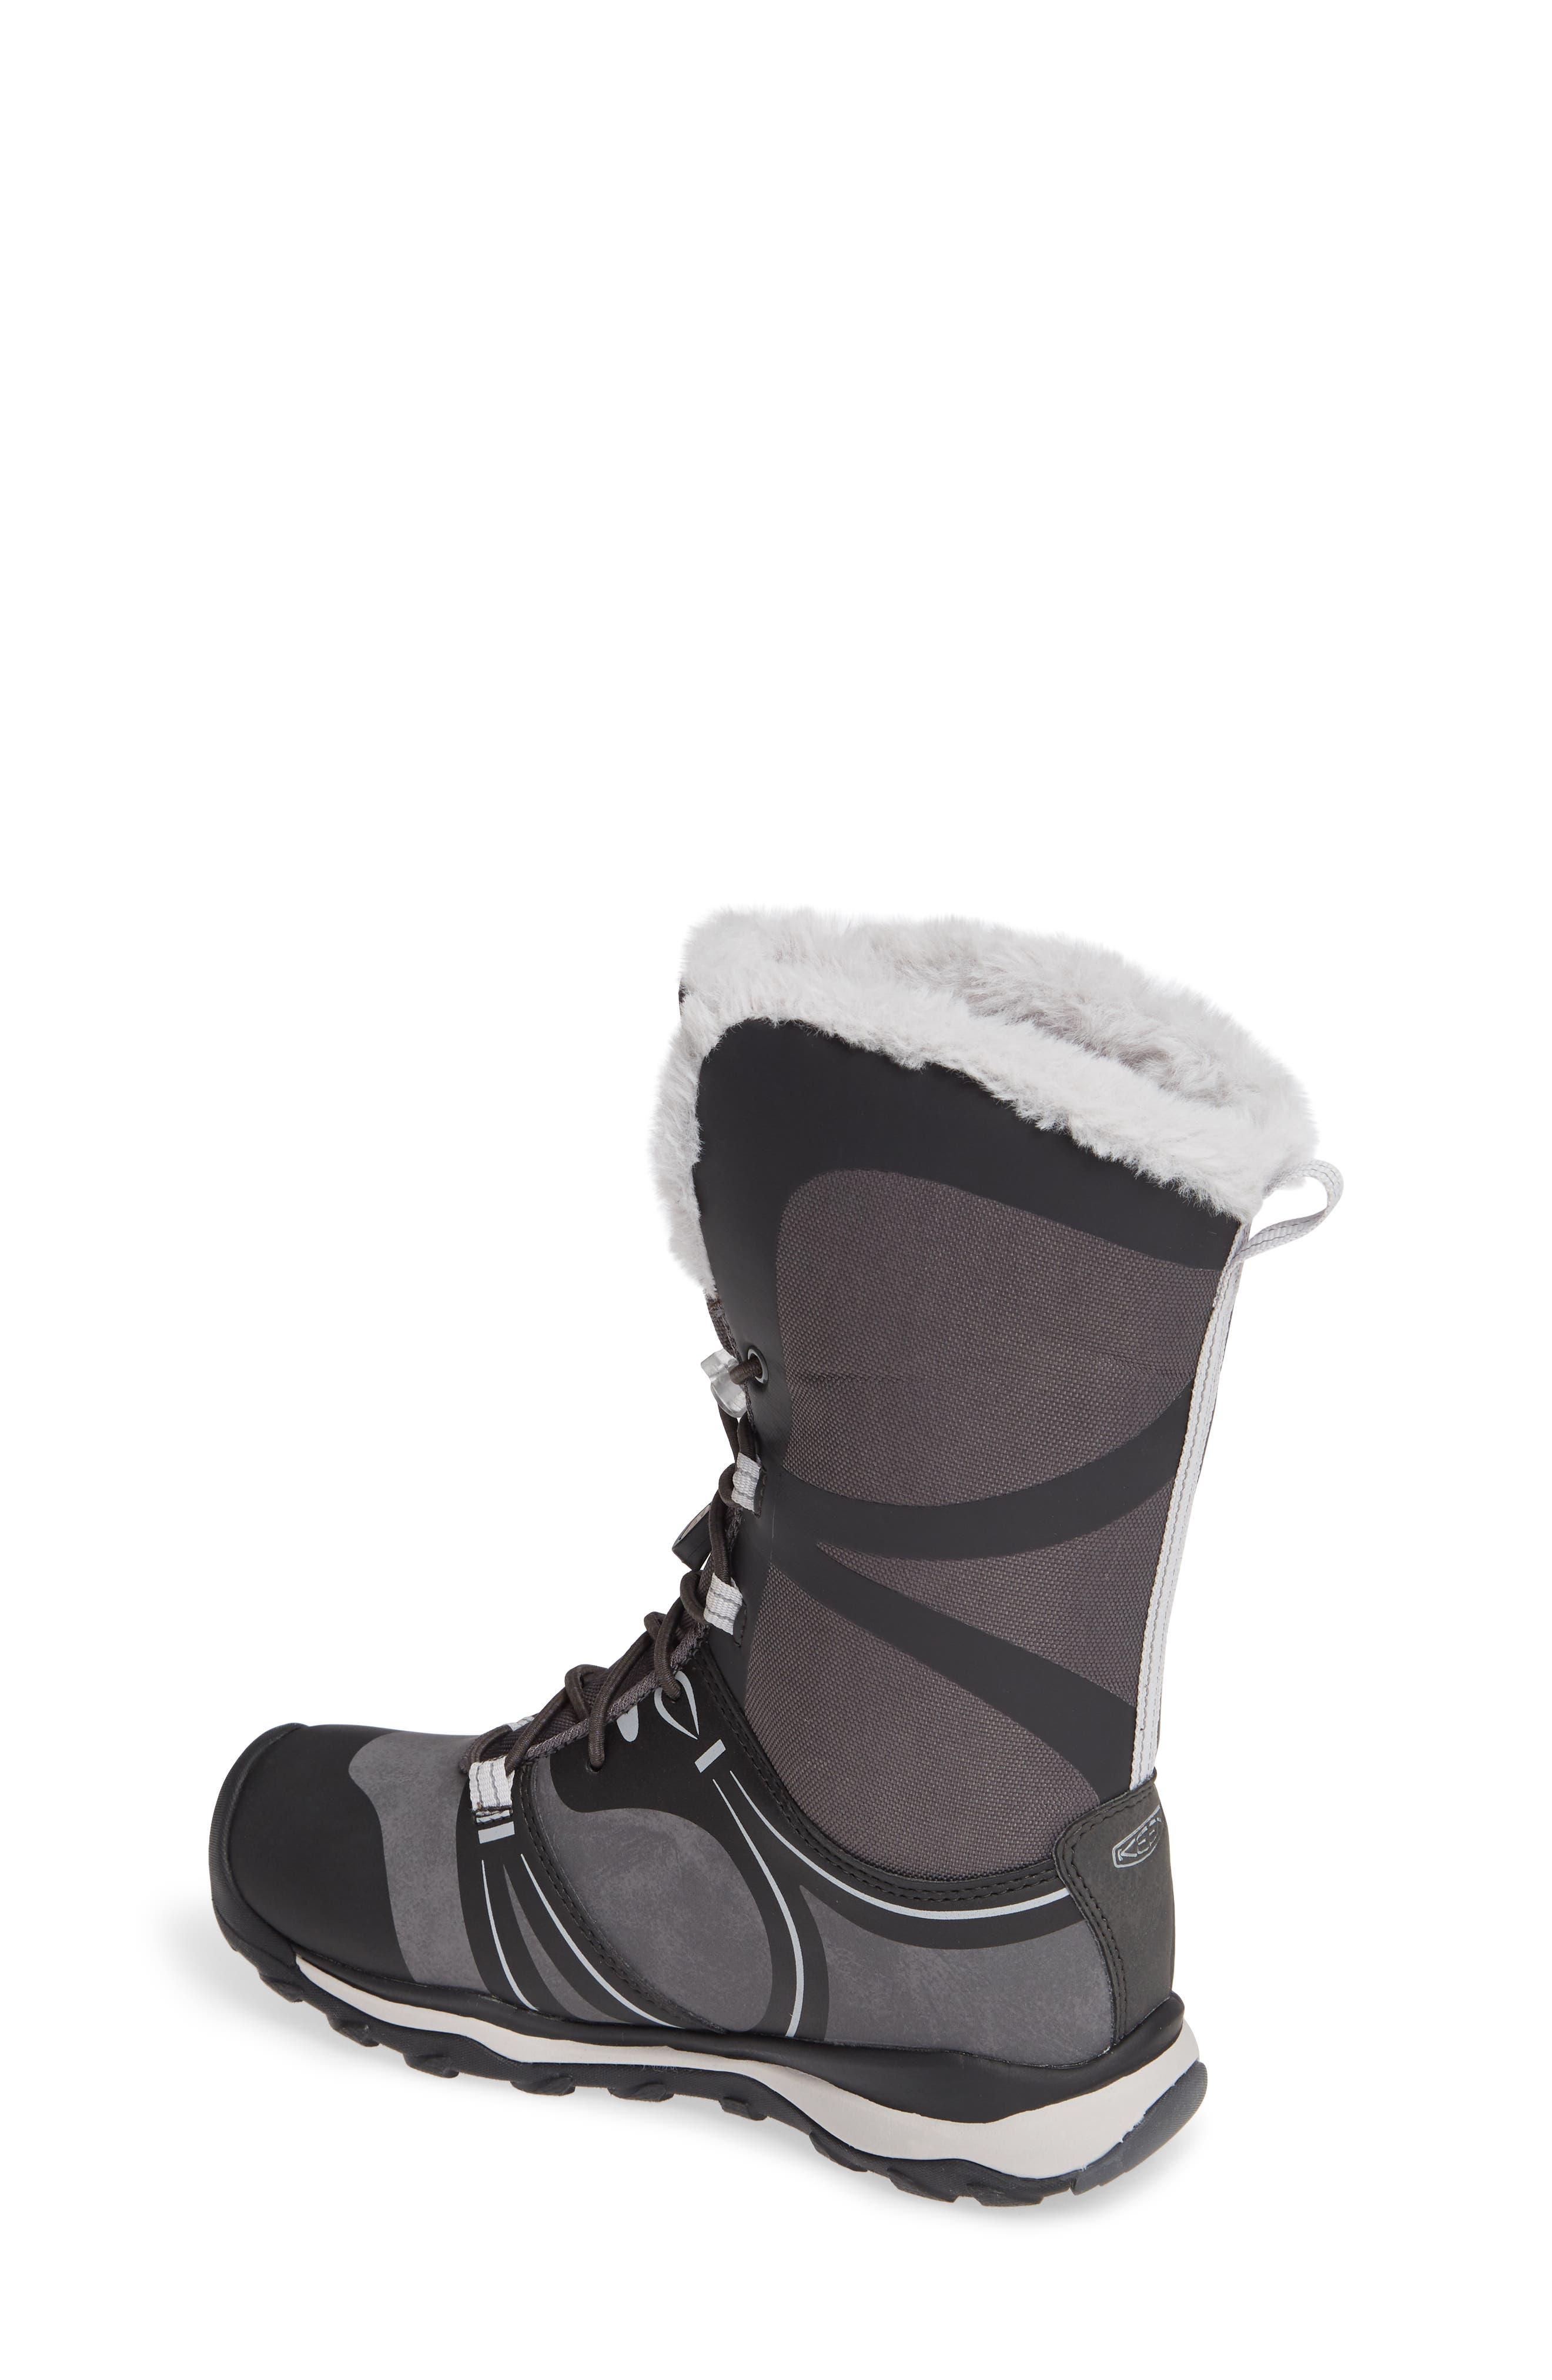 KEEN, Terradora Faux Fur Trim Waterproof Snow Boot, Alternate thumbnail 2, color, RAVEN/ VAPOR